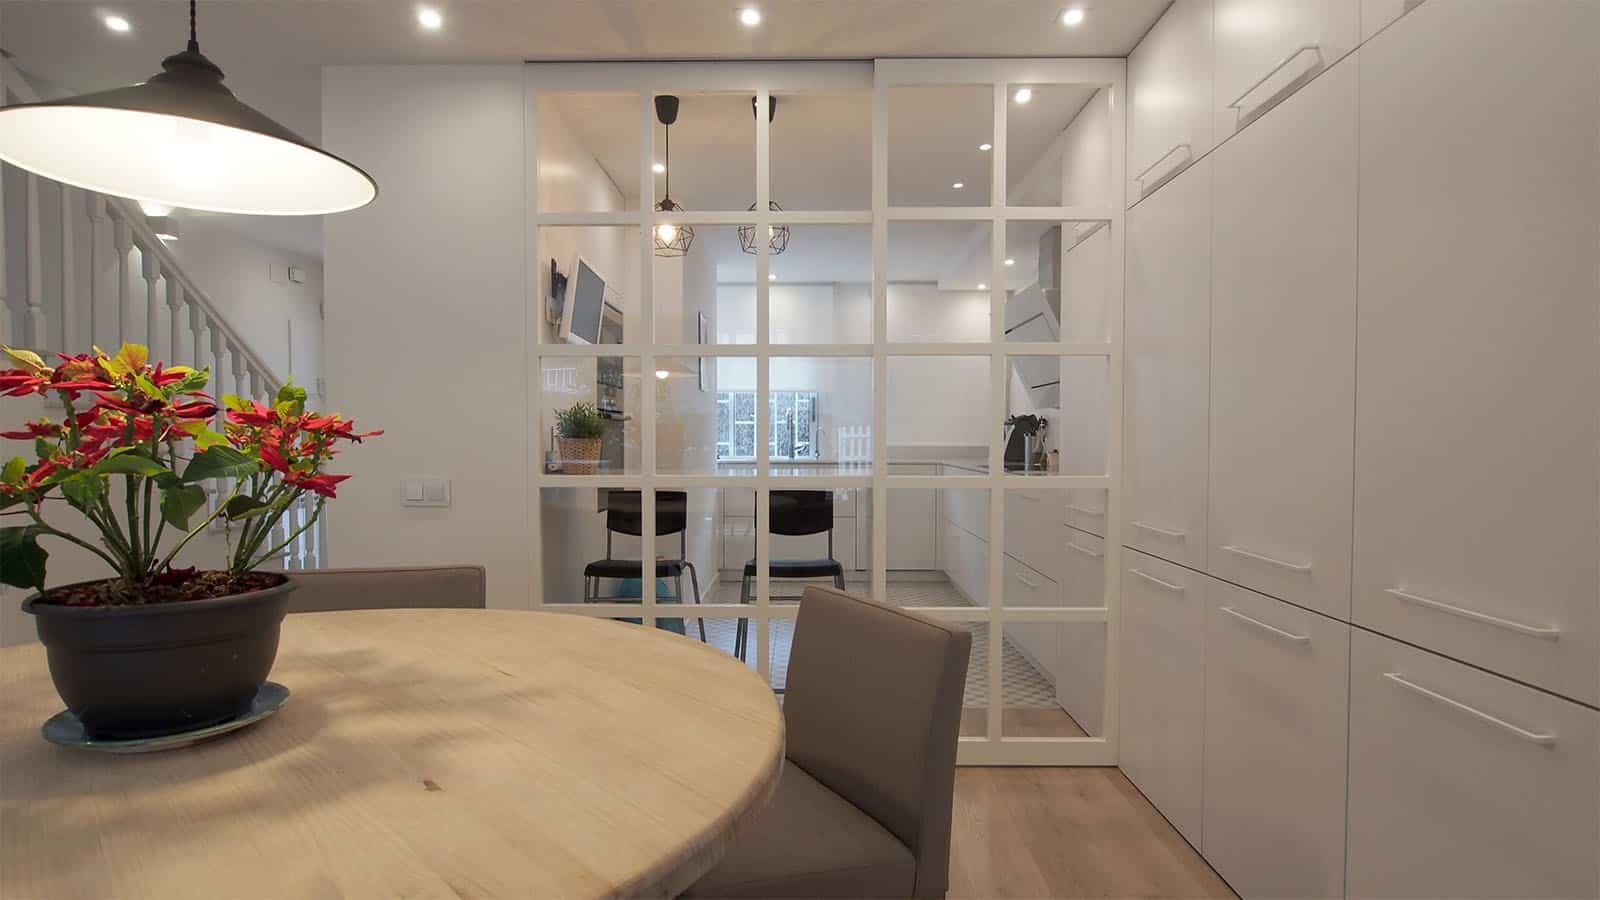 Reforma integral vivienda Sant Cugat del Vallès. Glow Rehabilita.